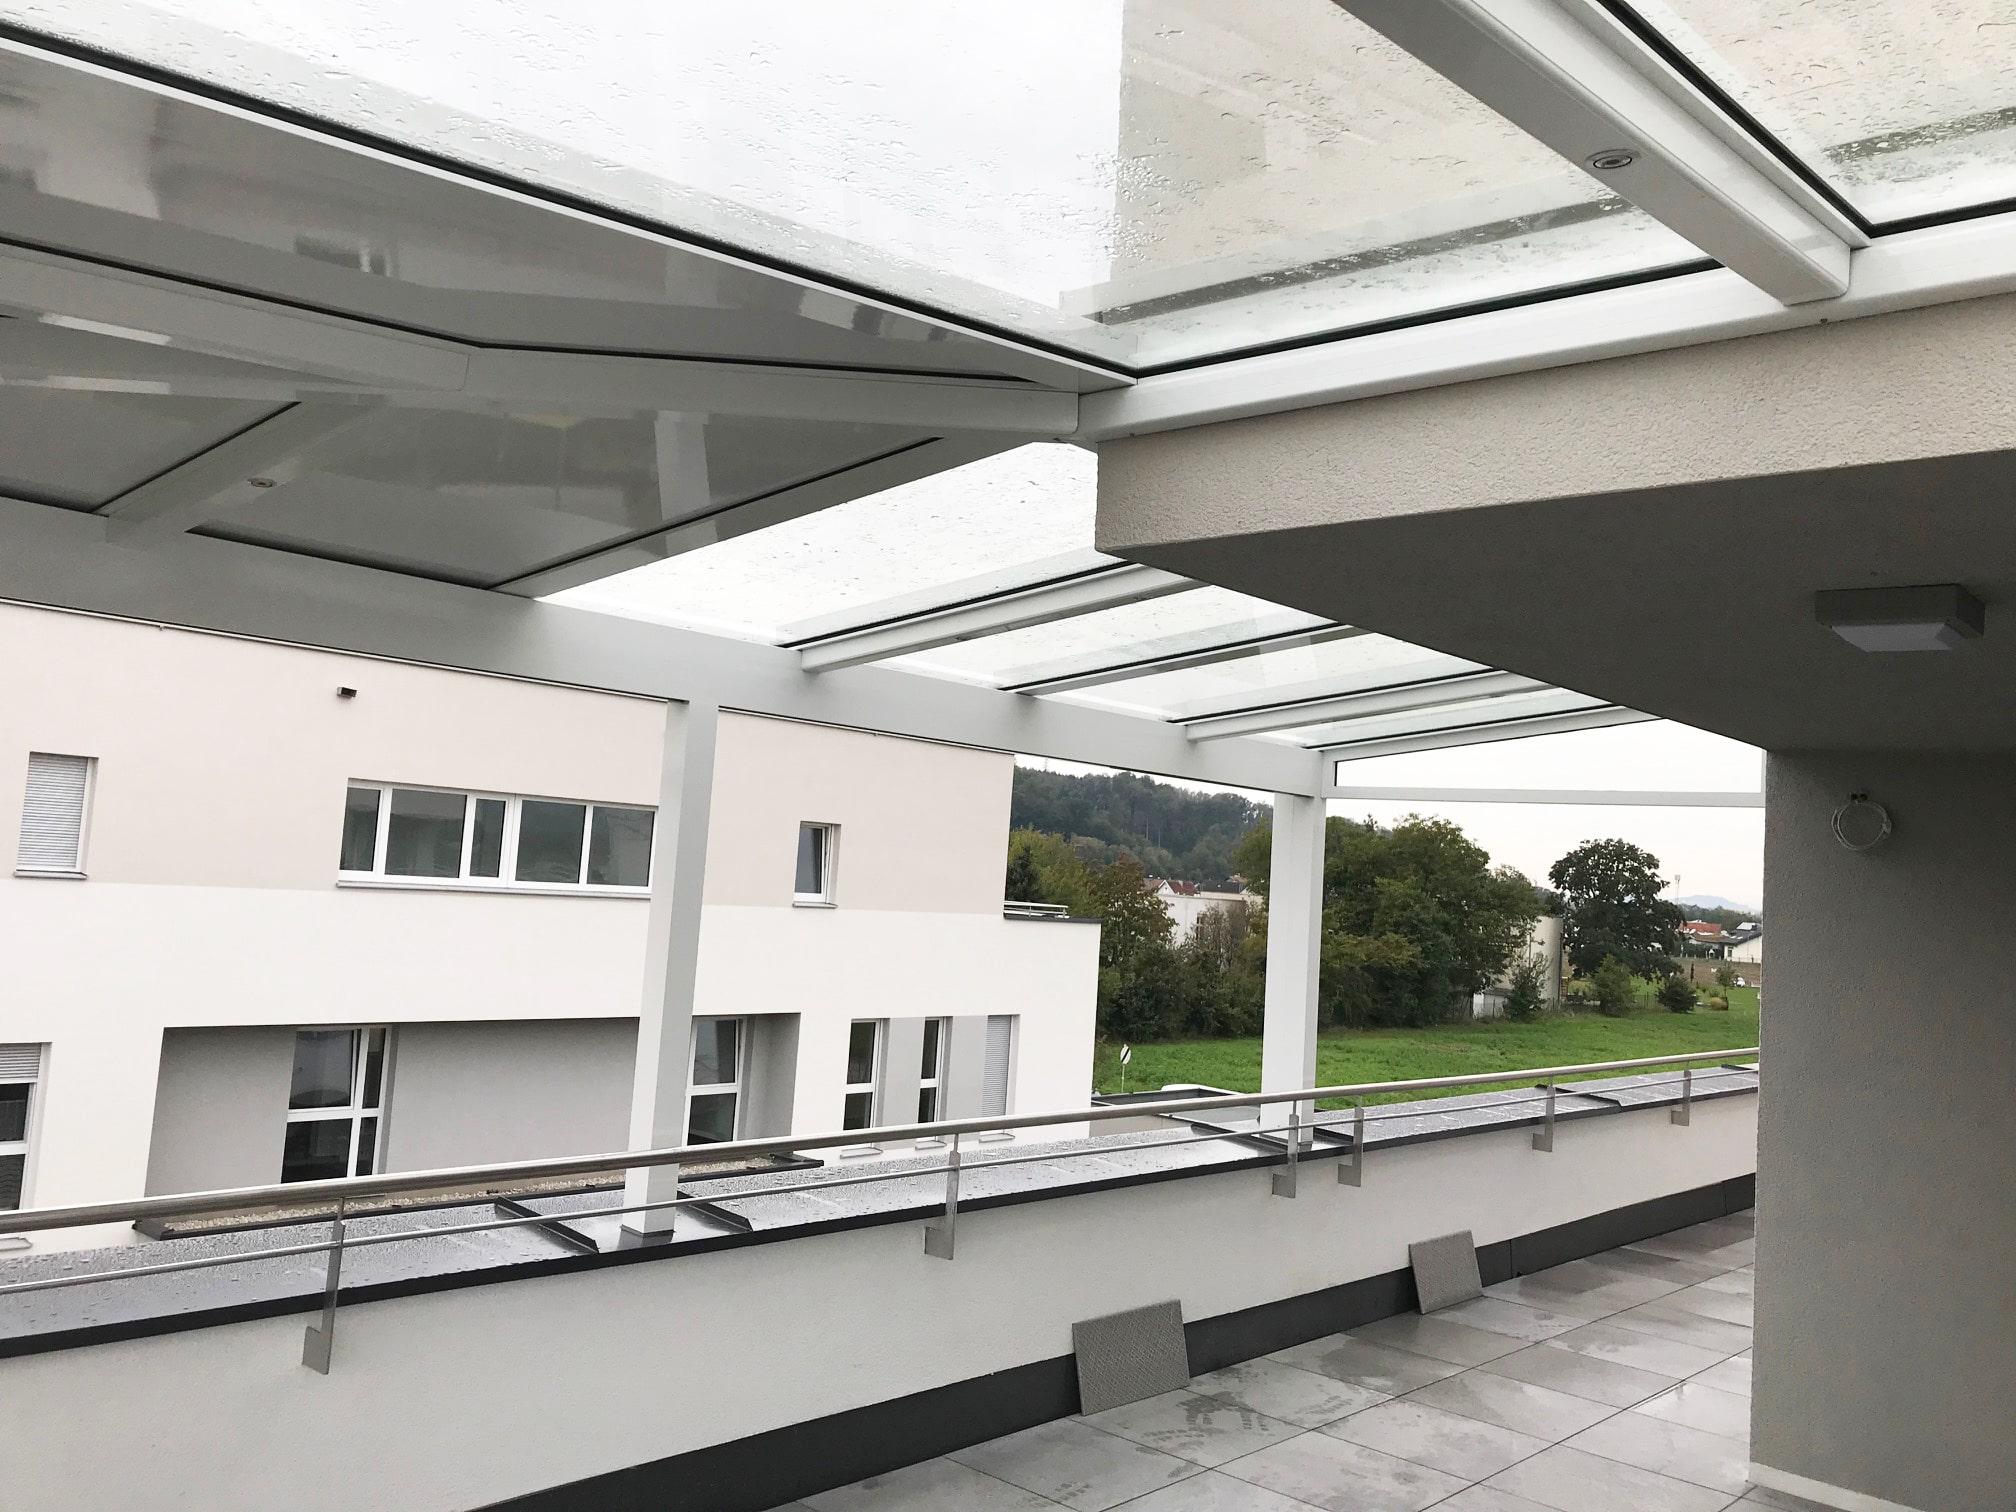 Überdachung Terrasse in Pichling - Oberösterreich